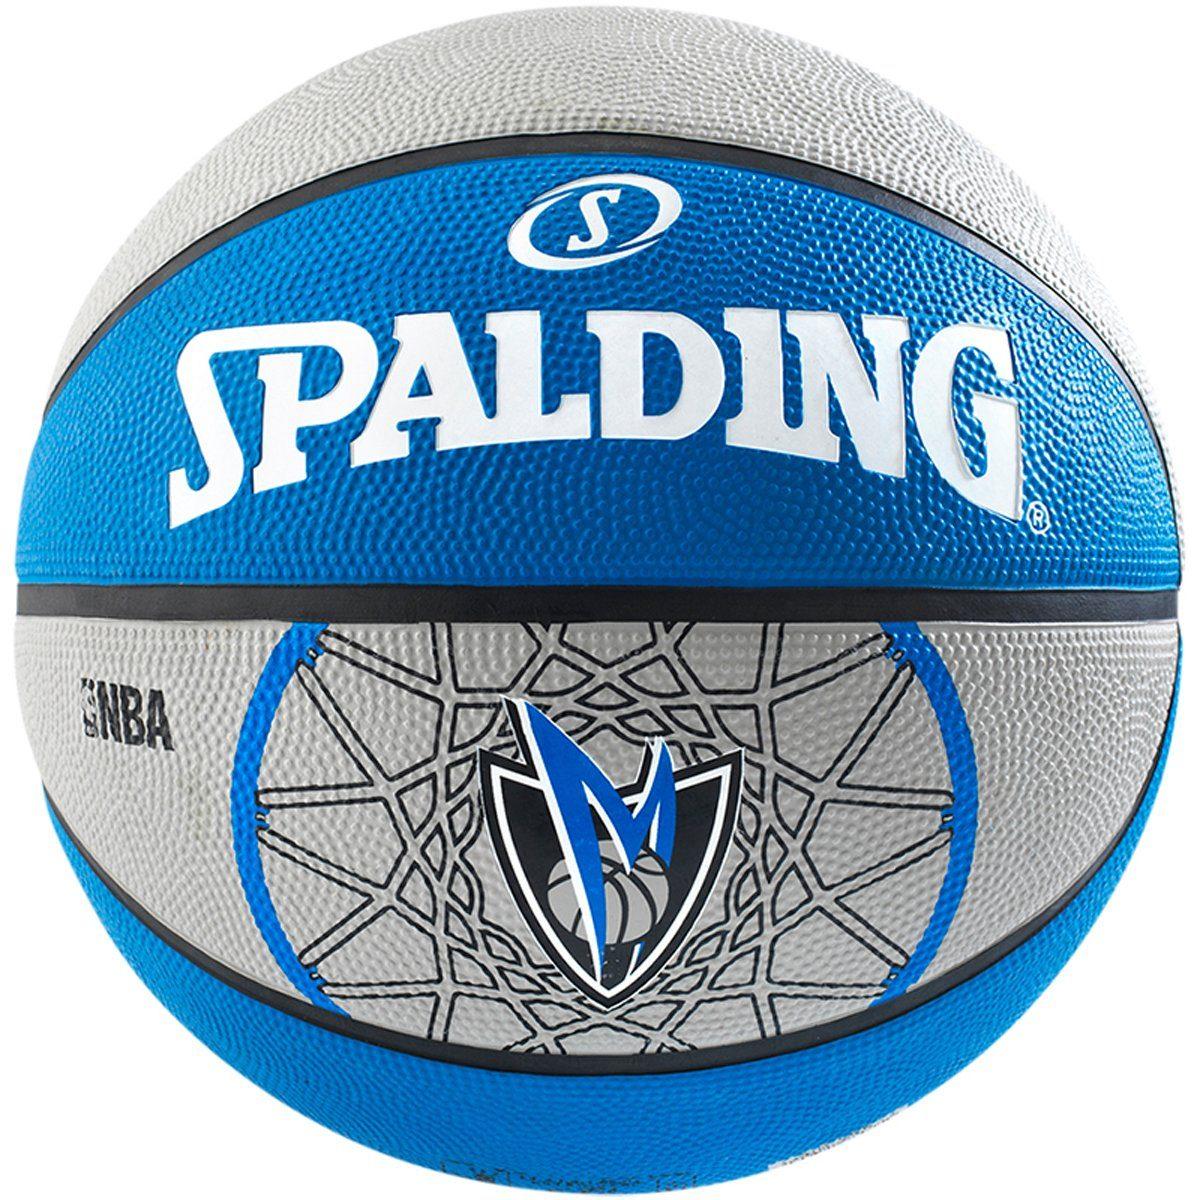 SPALDING Team Mavericks Basketball